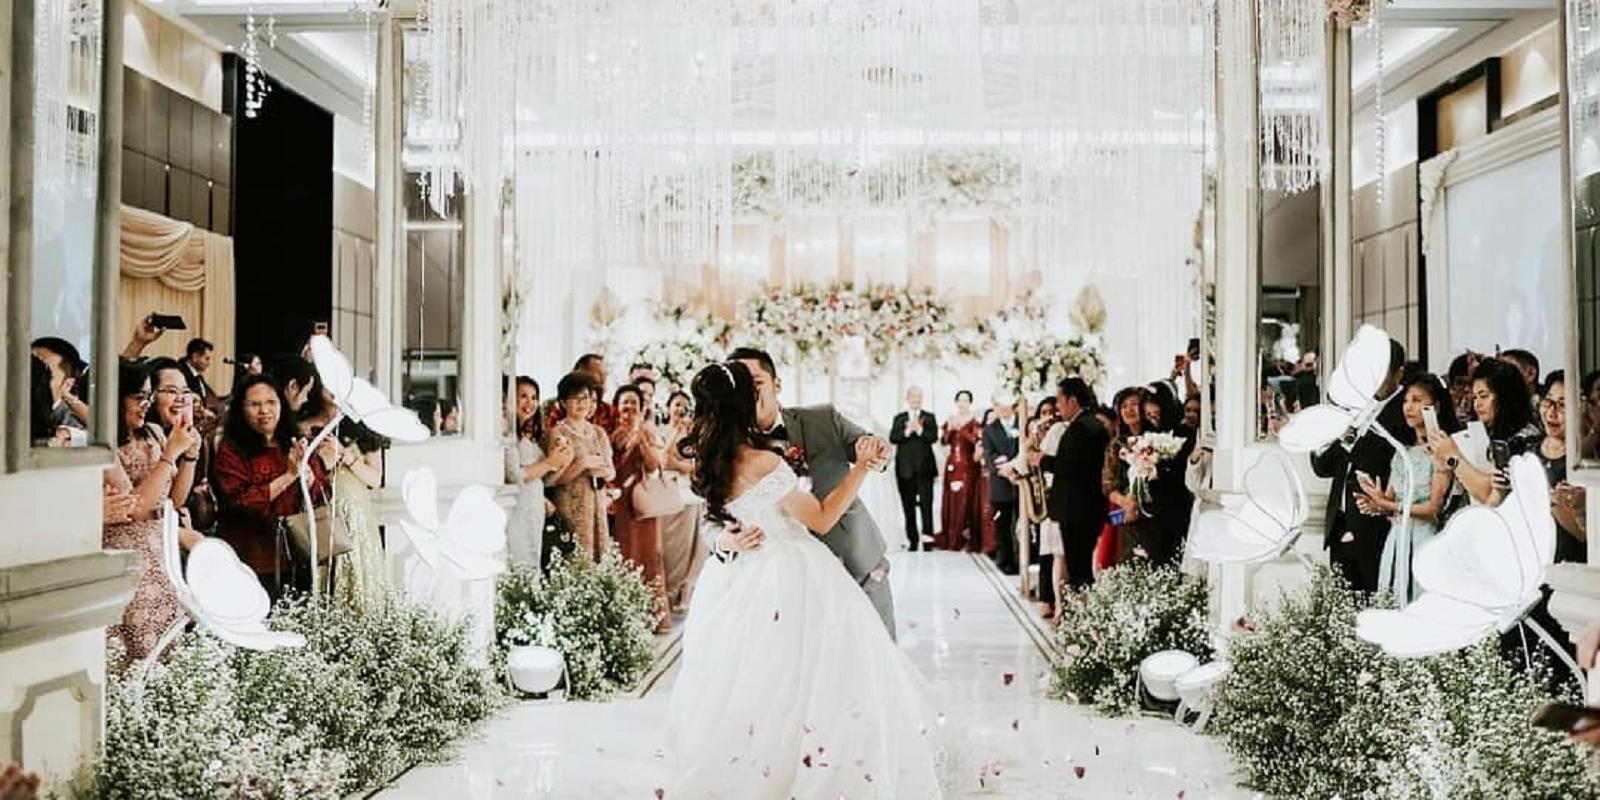 Crowne Plaza Jakarta Jakarta Indonesia Hotel Ihg - Wedding Venue Jakarta, 7 Rekomendasi Wedding Venue Intimate Di Jakarta Yang Mempesona Tempat Com